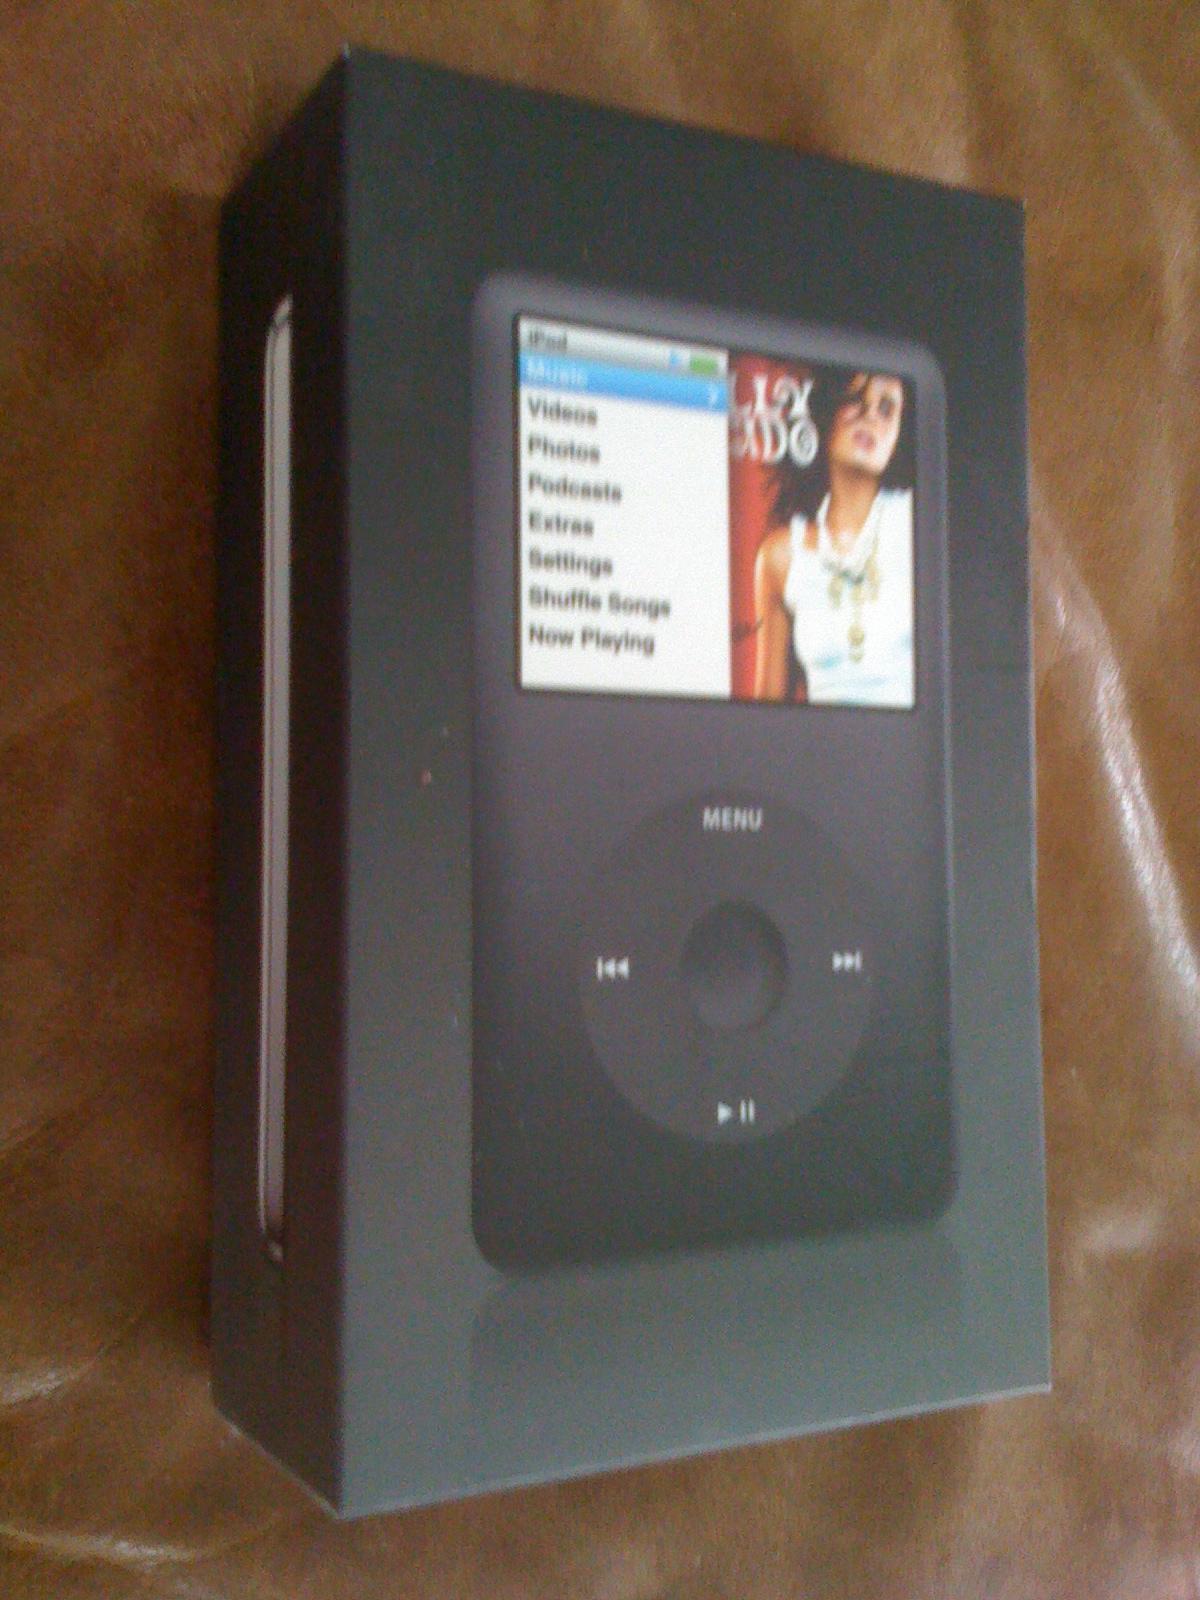 sold 6th generation ipod classic 80gb black great condition rh head fi org ipod classic service manual 160GB iPod Classic 6th Gen